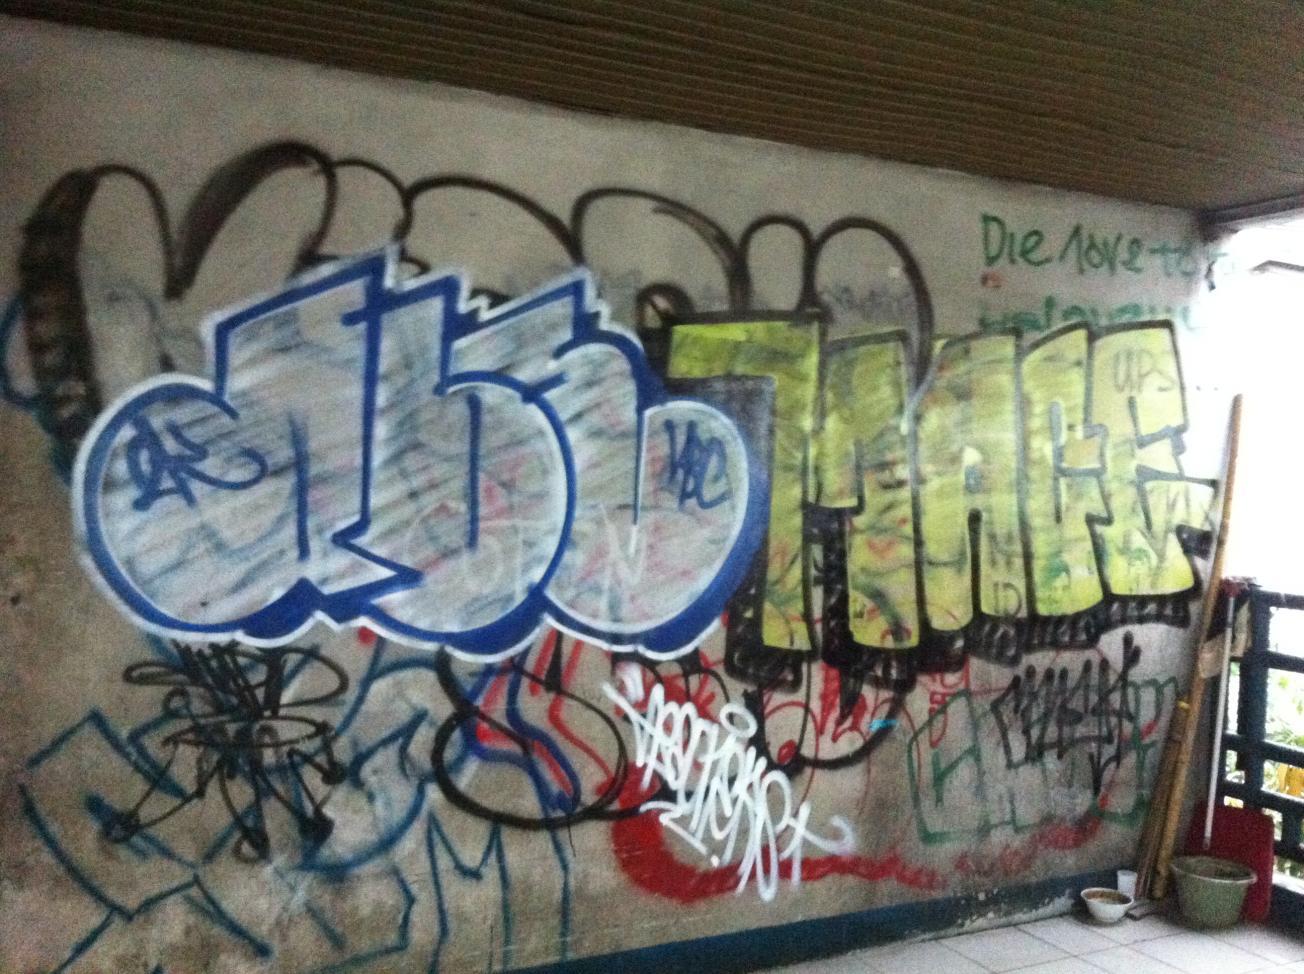 abeoners abers bandung graffiti nbc ubung mace4 2k throwie throwup.jpg